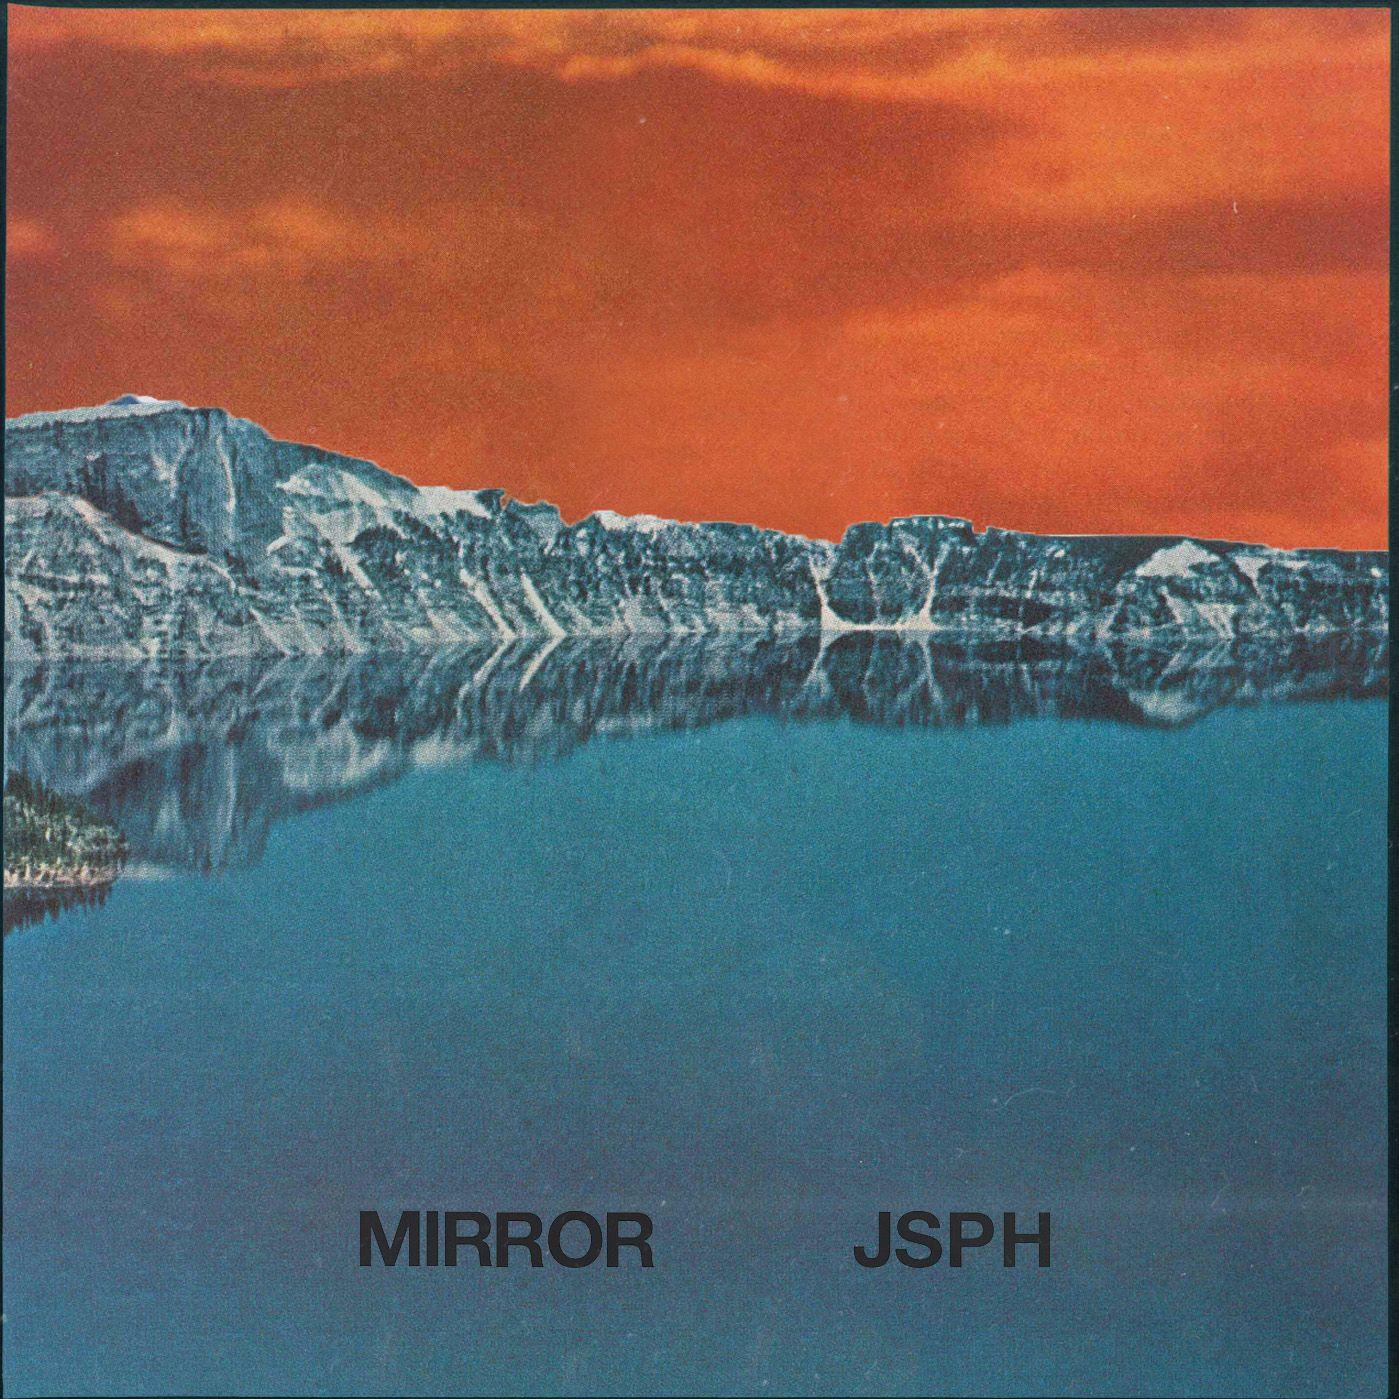 jsph mirror